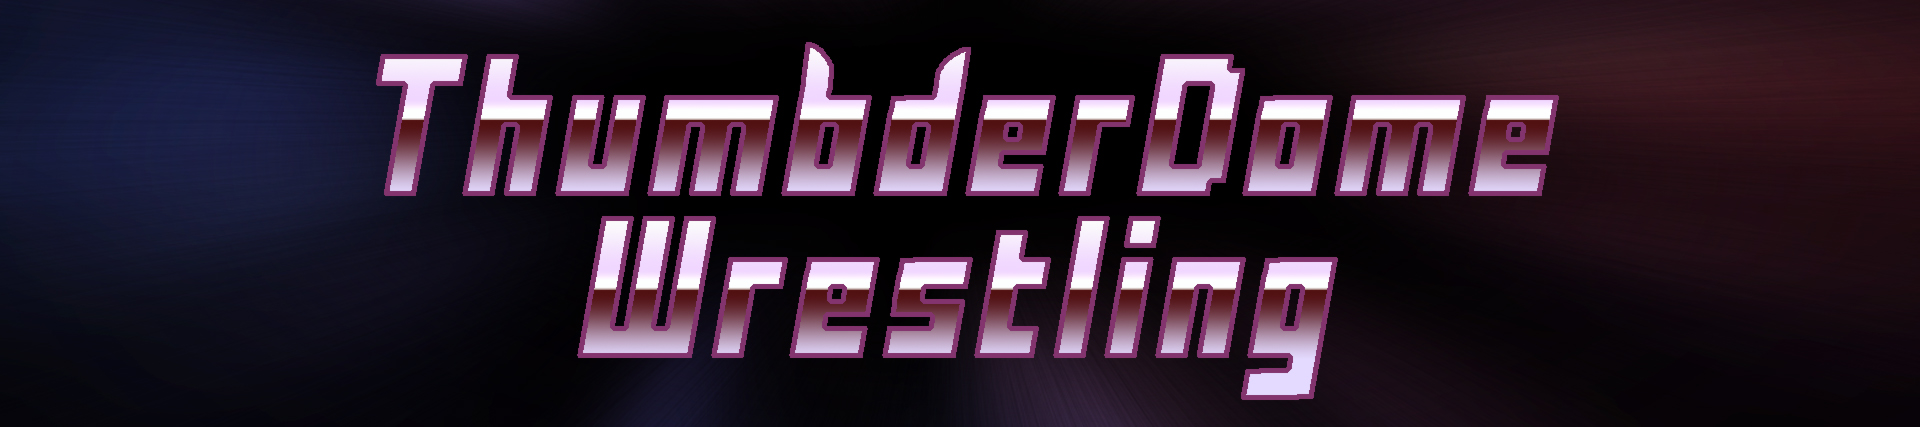 ThumbderDome Wrestling